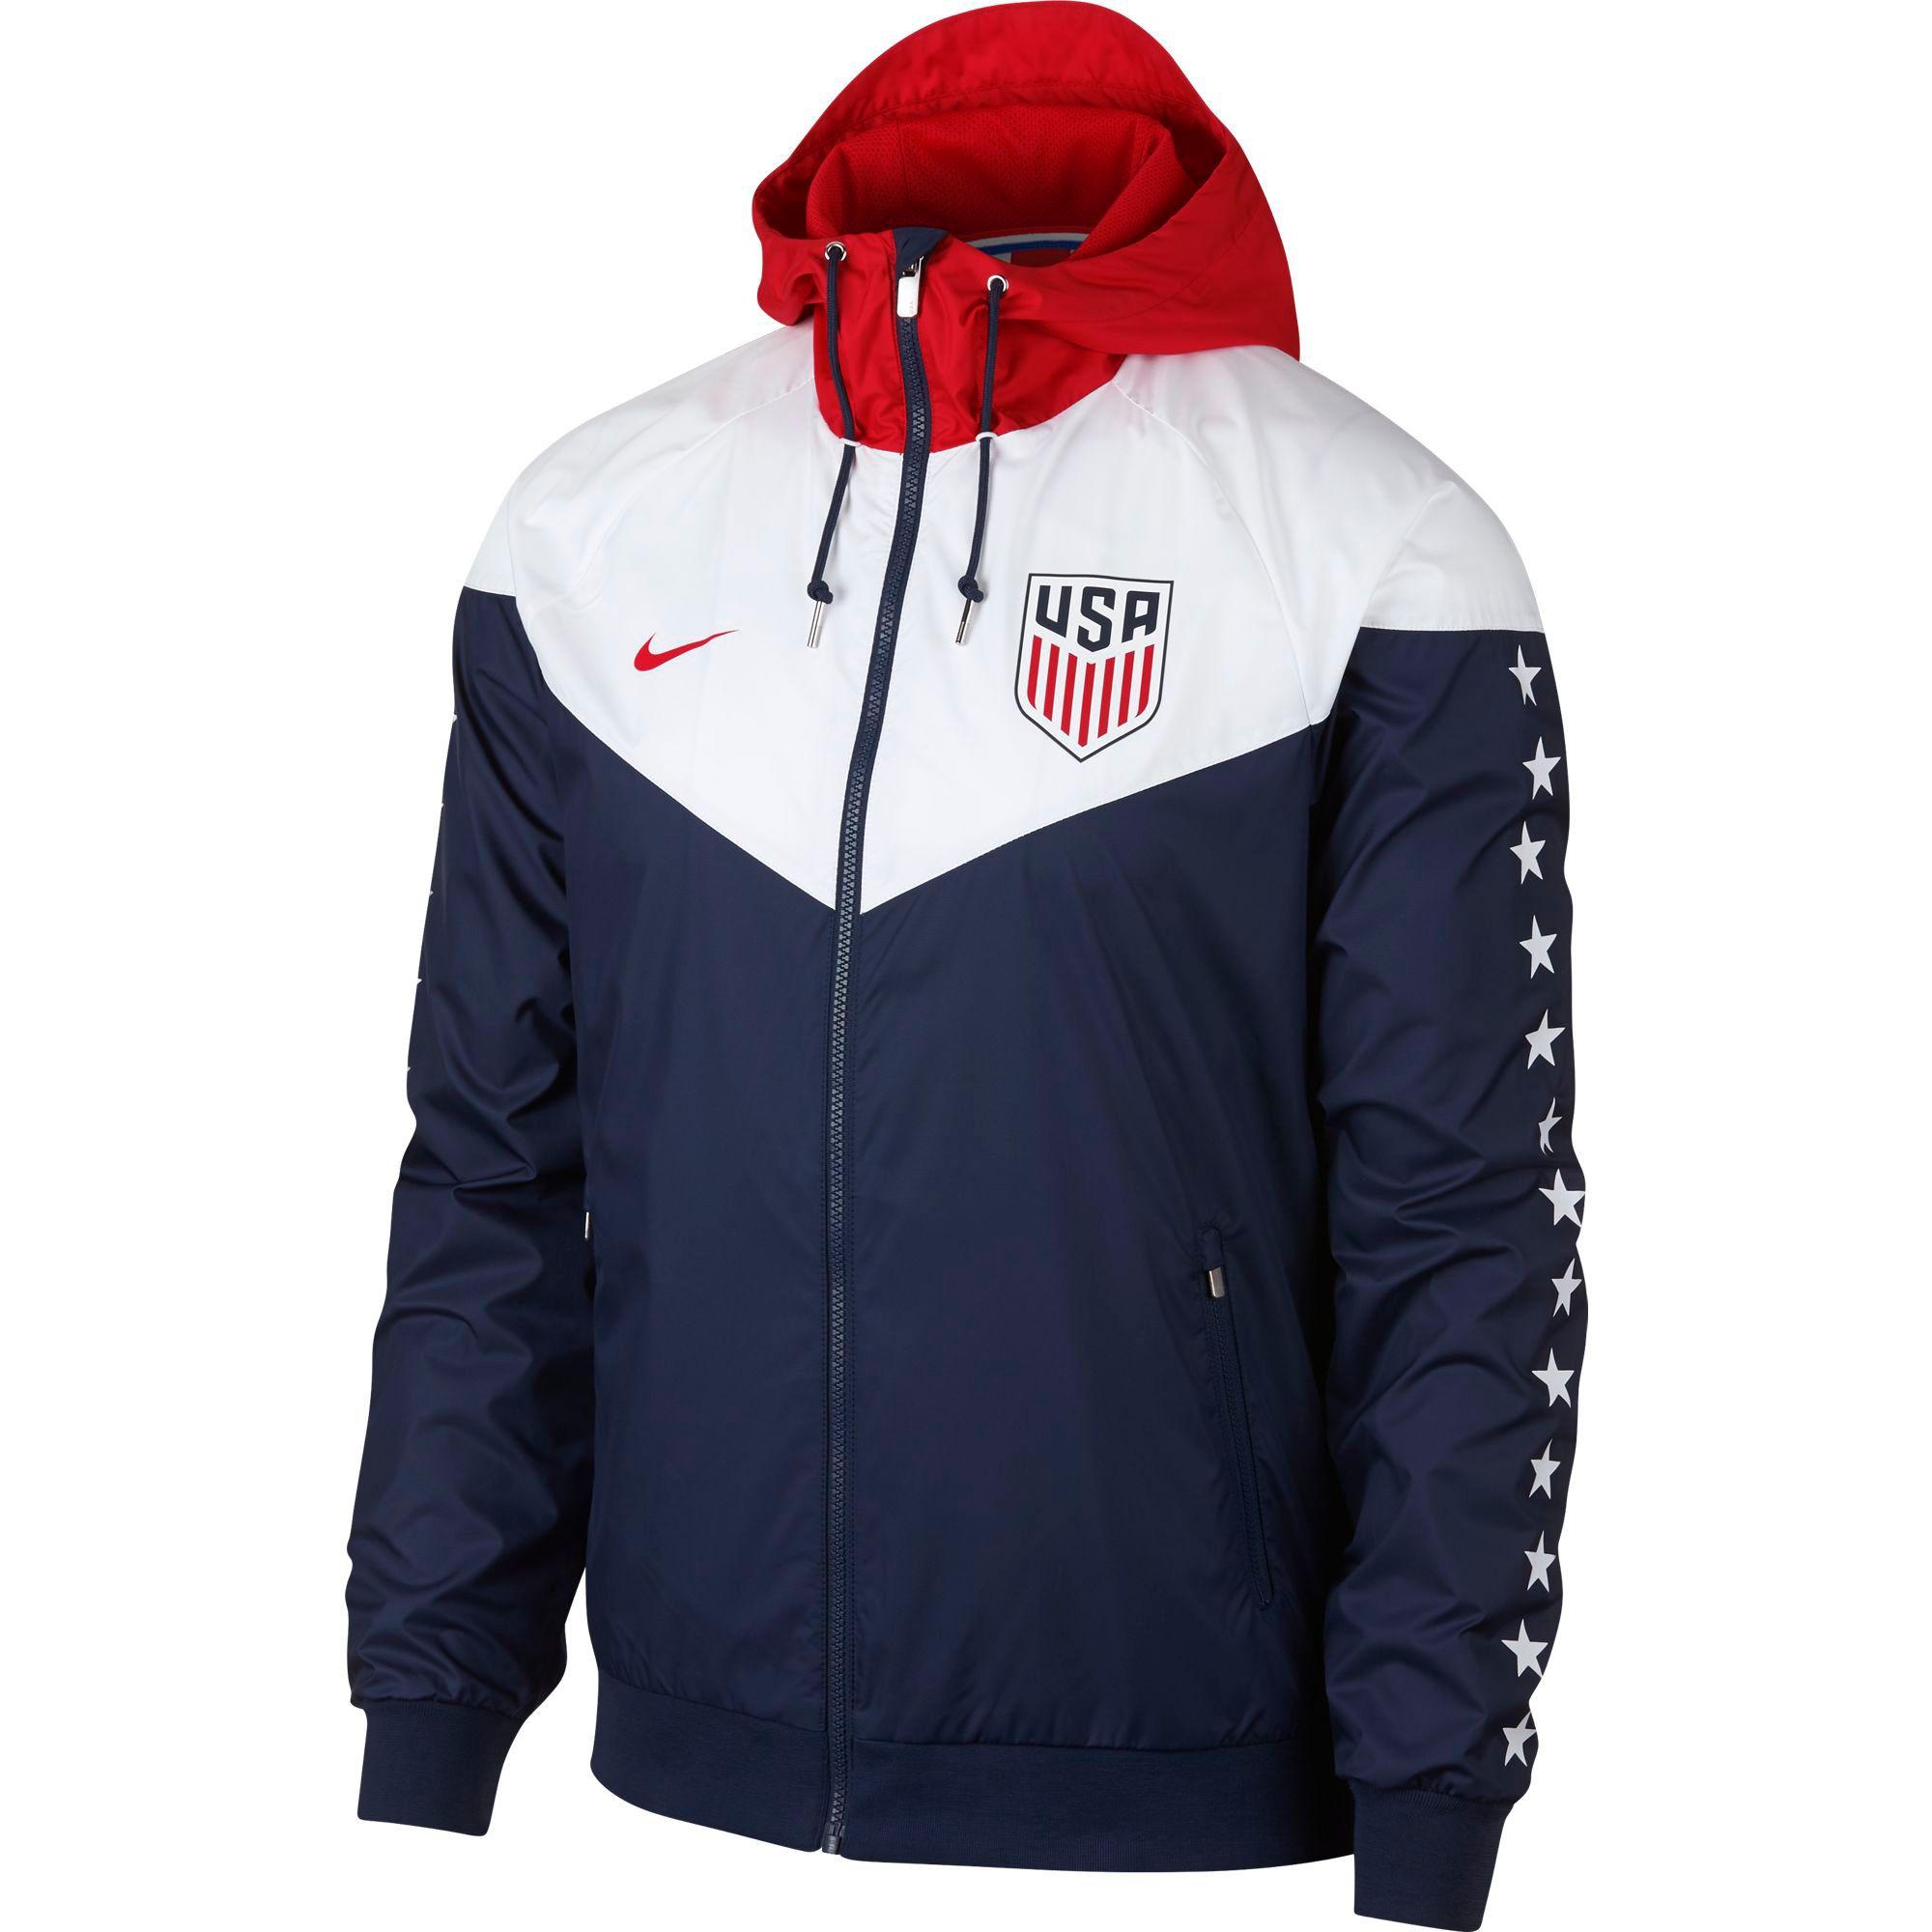 Nike Men S Sportswear Usa Windrunner Jacket Dick S Sporting